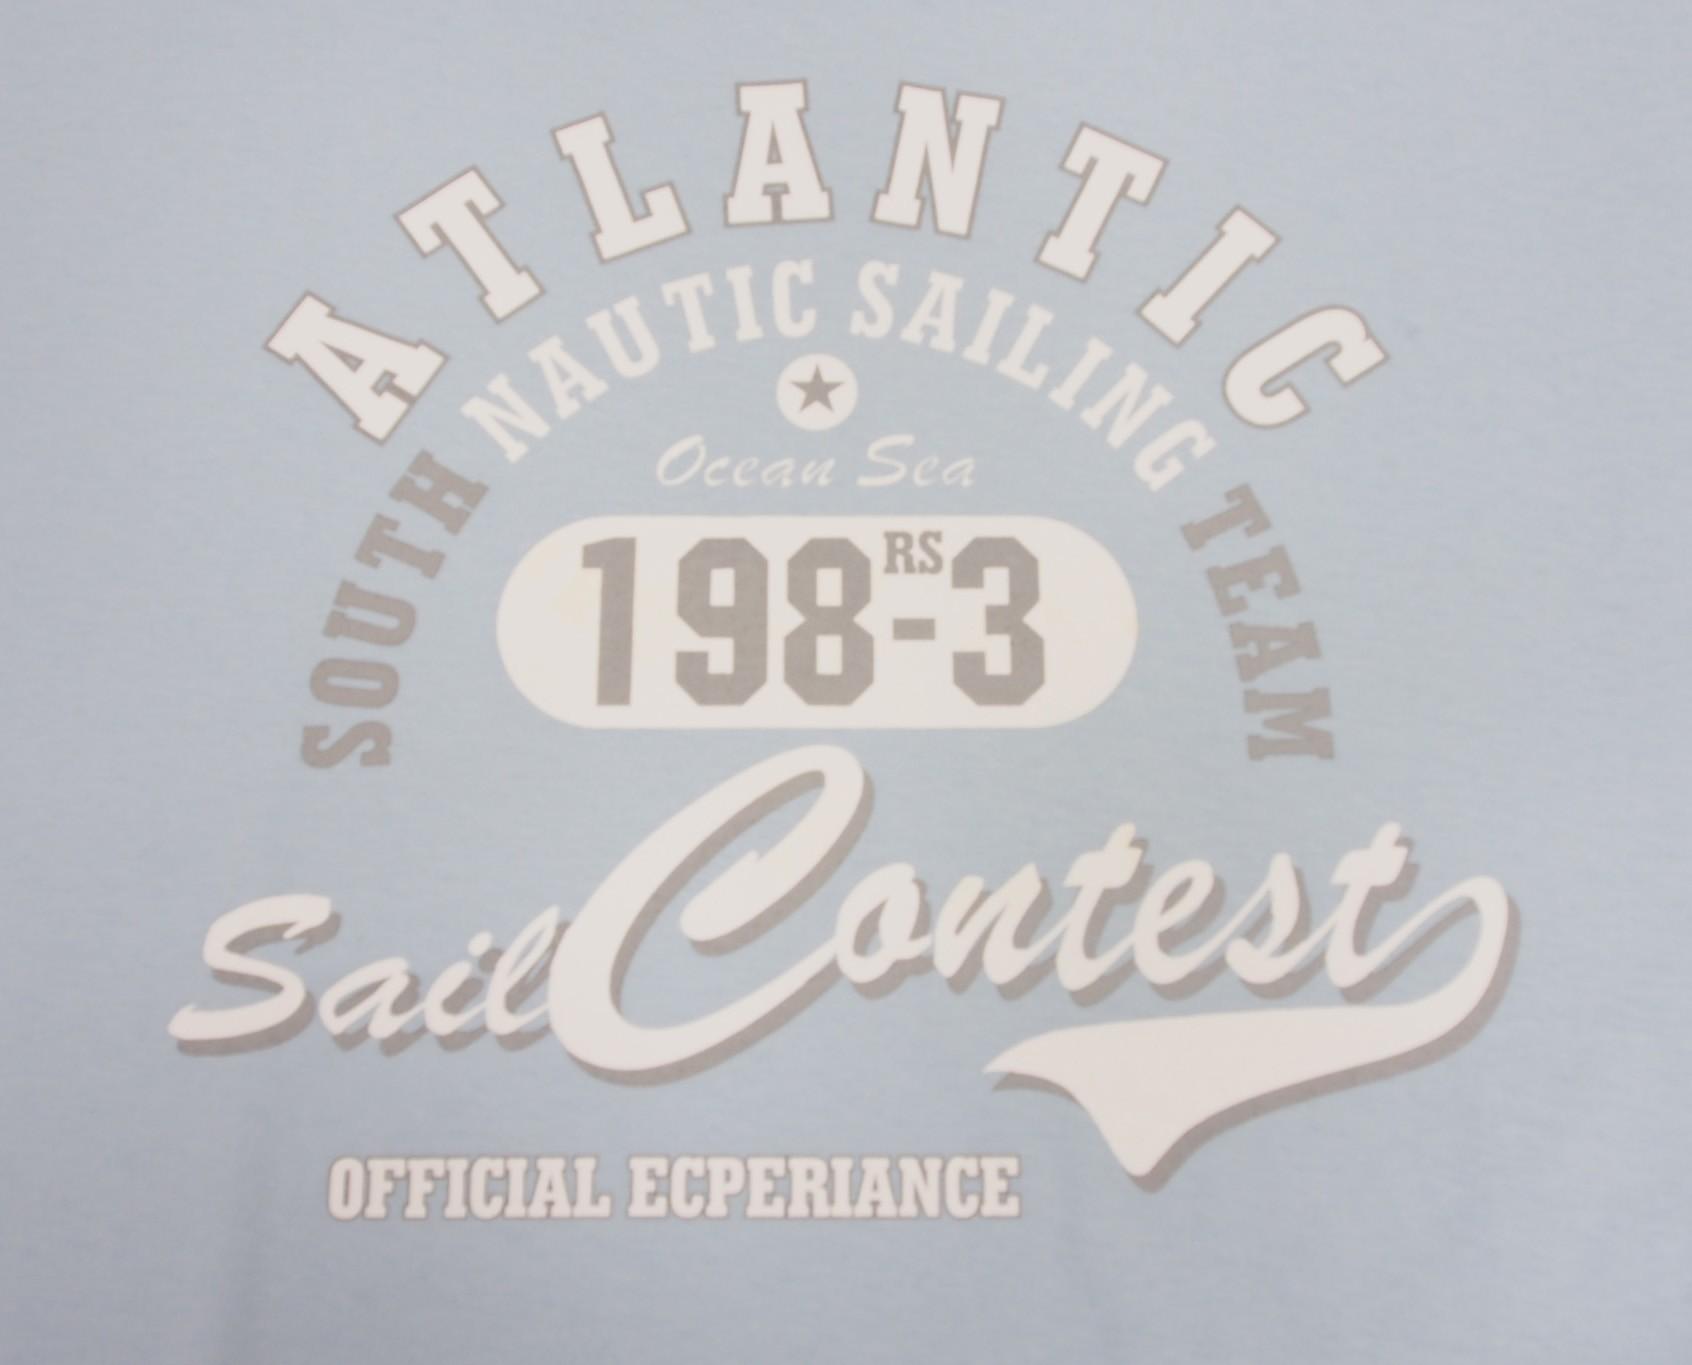 Atlantic - Bledě modrá s bílou